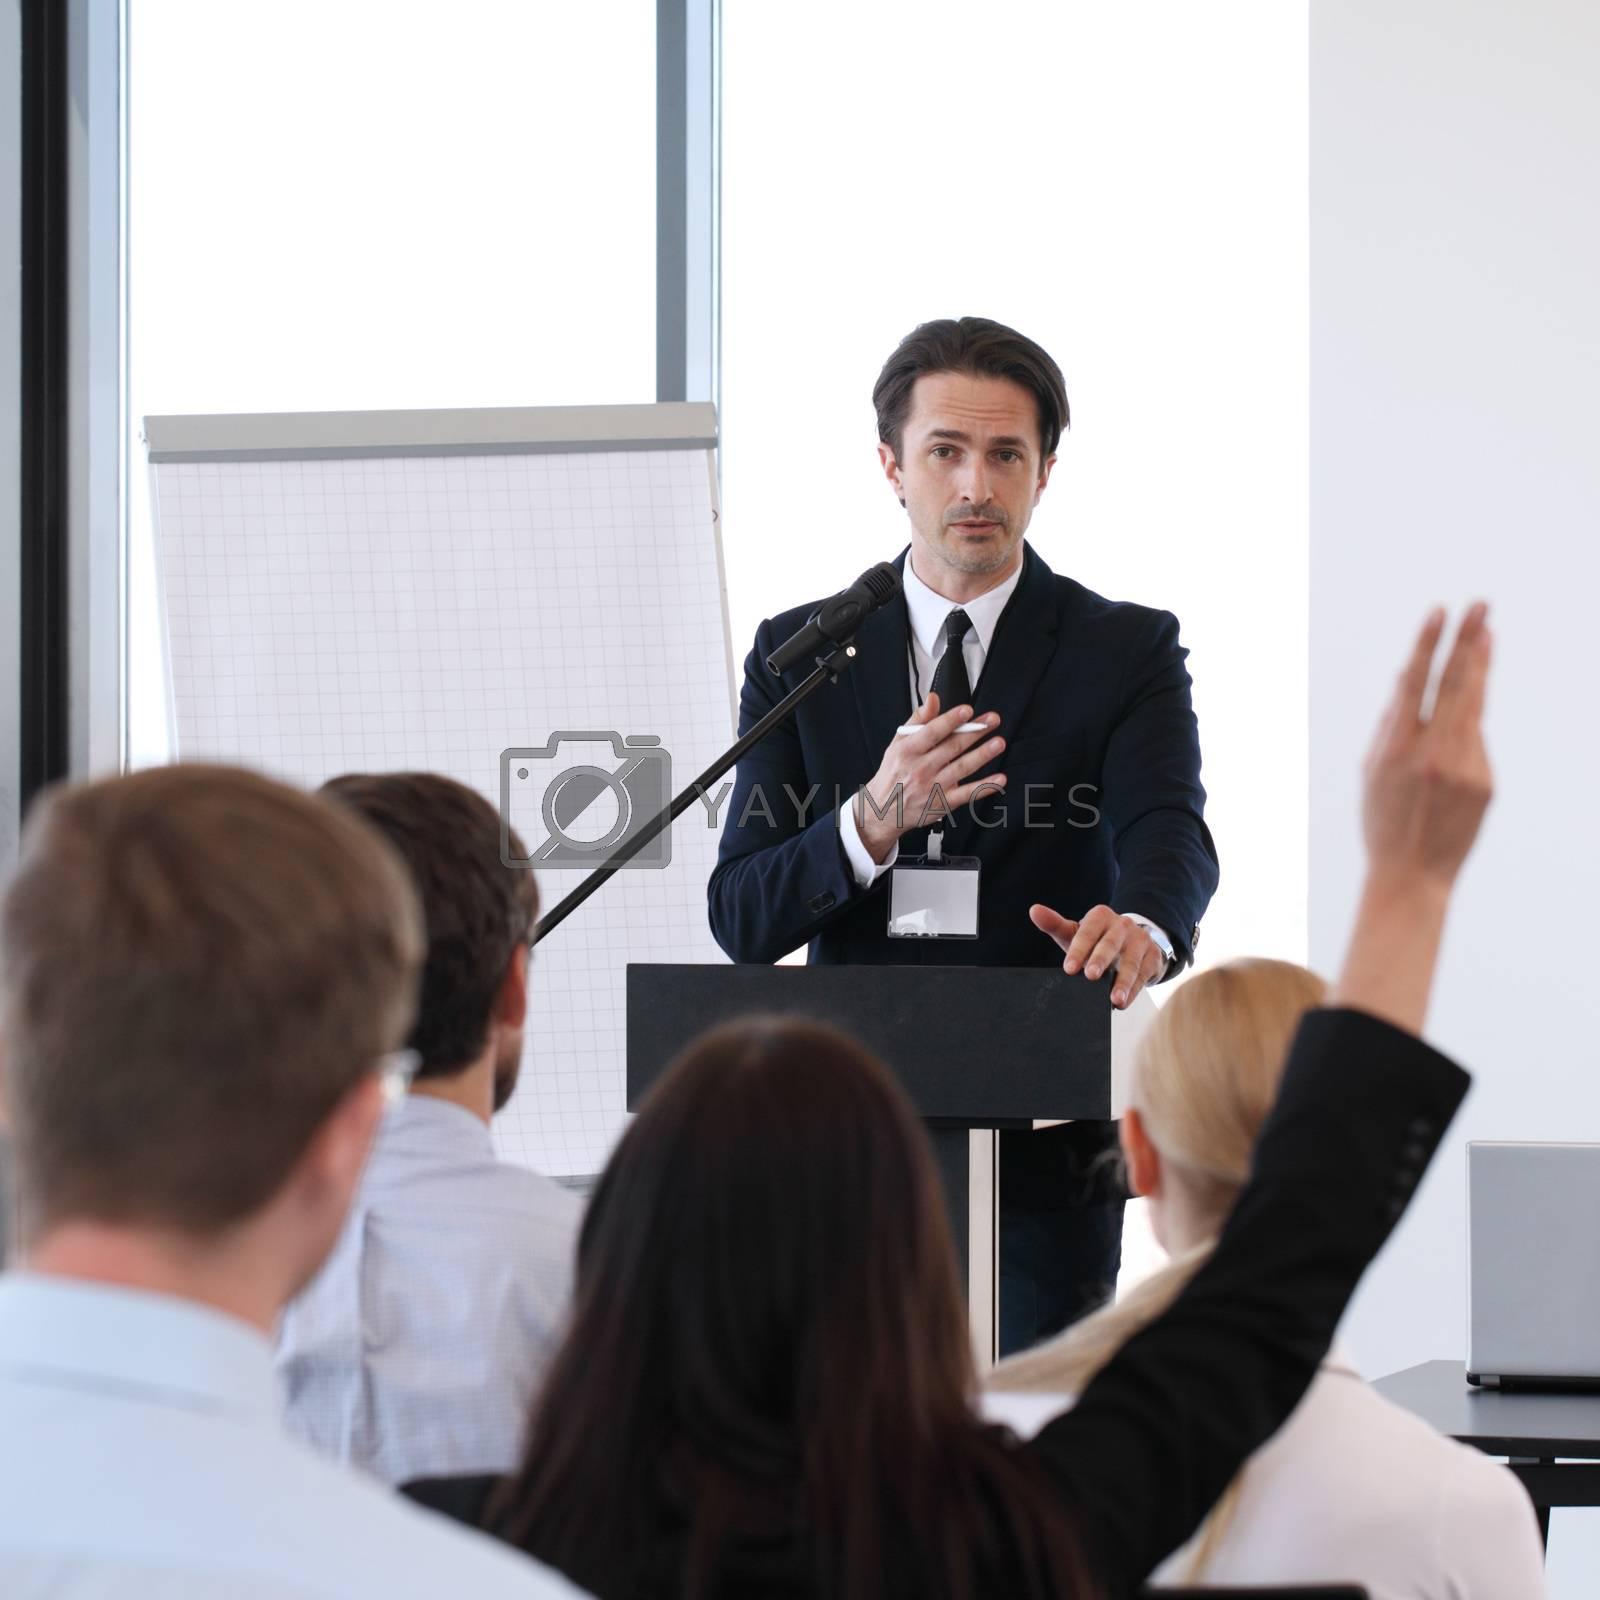 Speakers at business meeting by ALotOfPeople